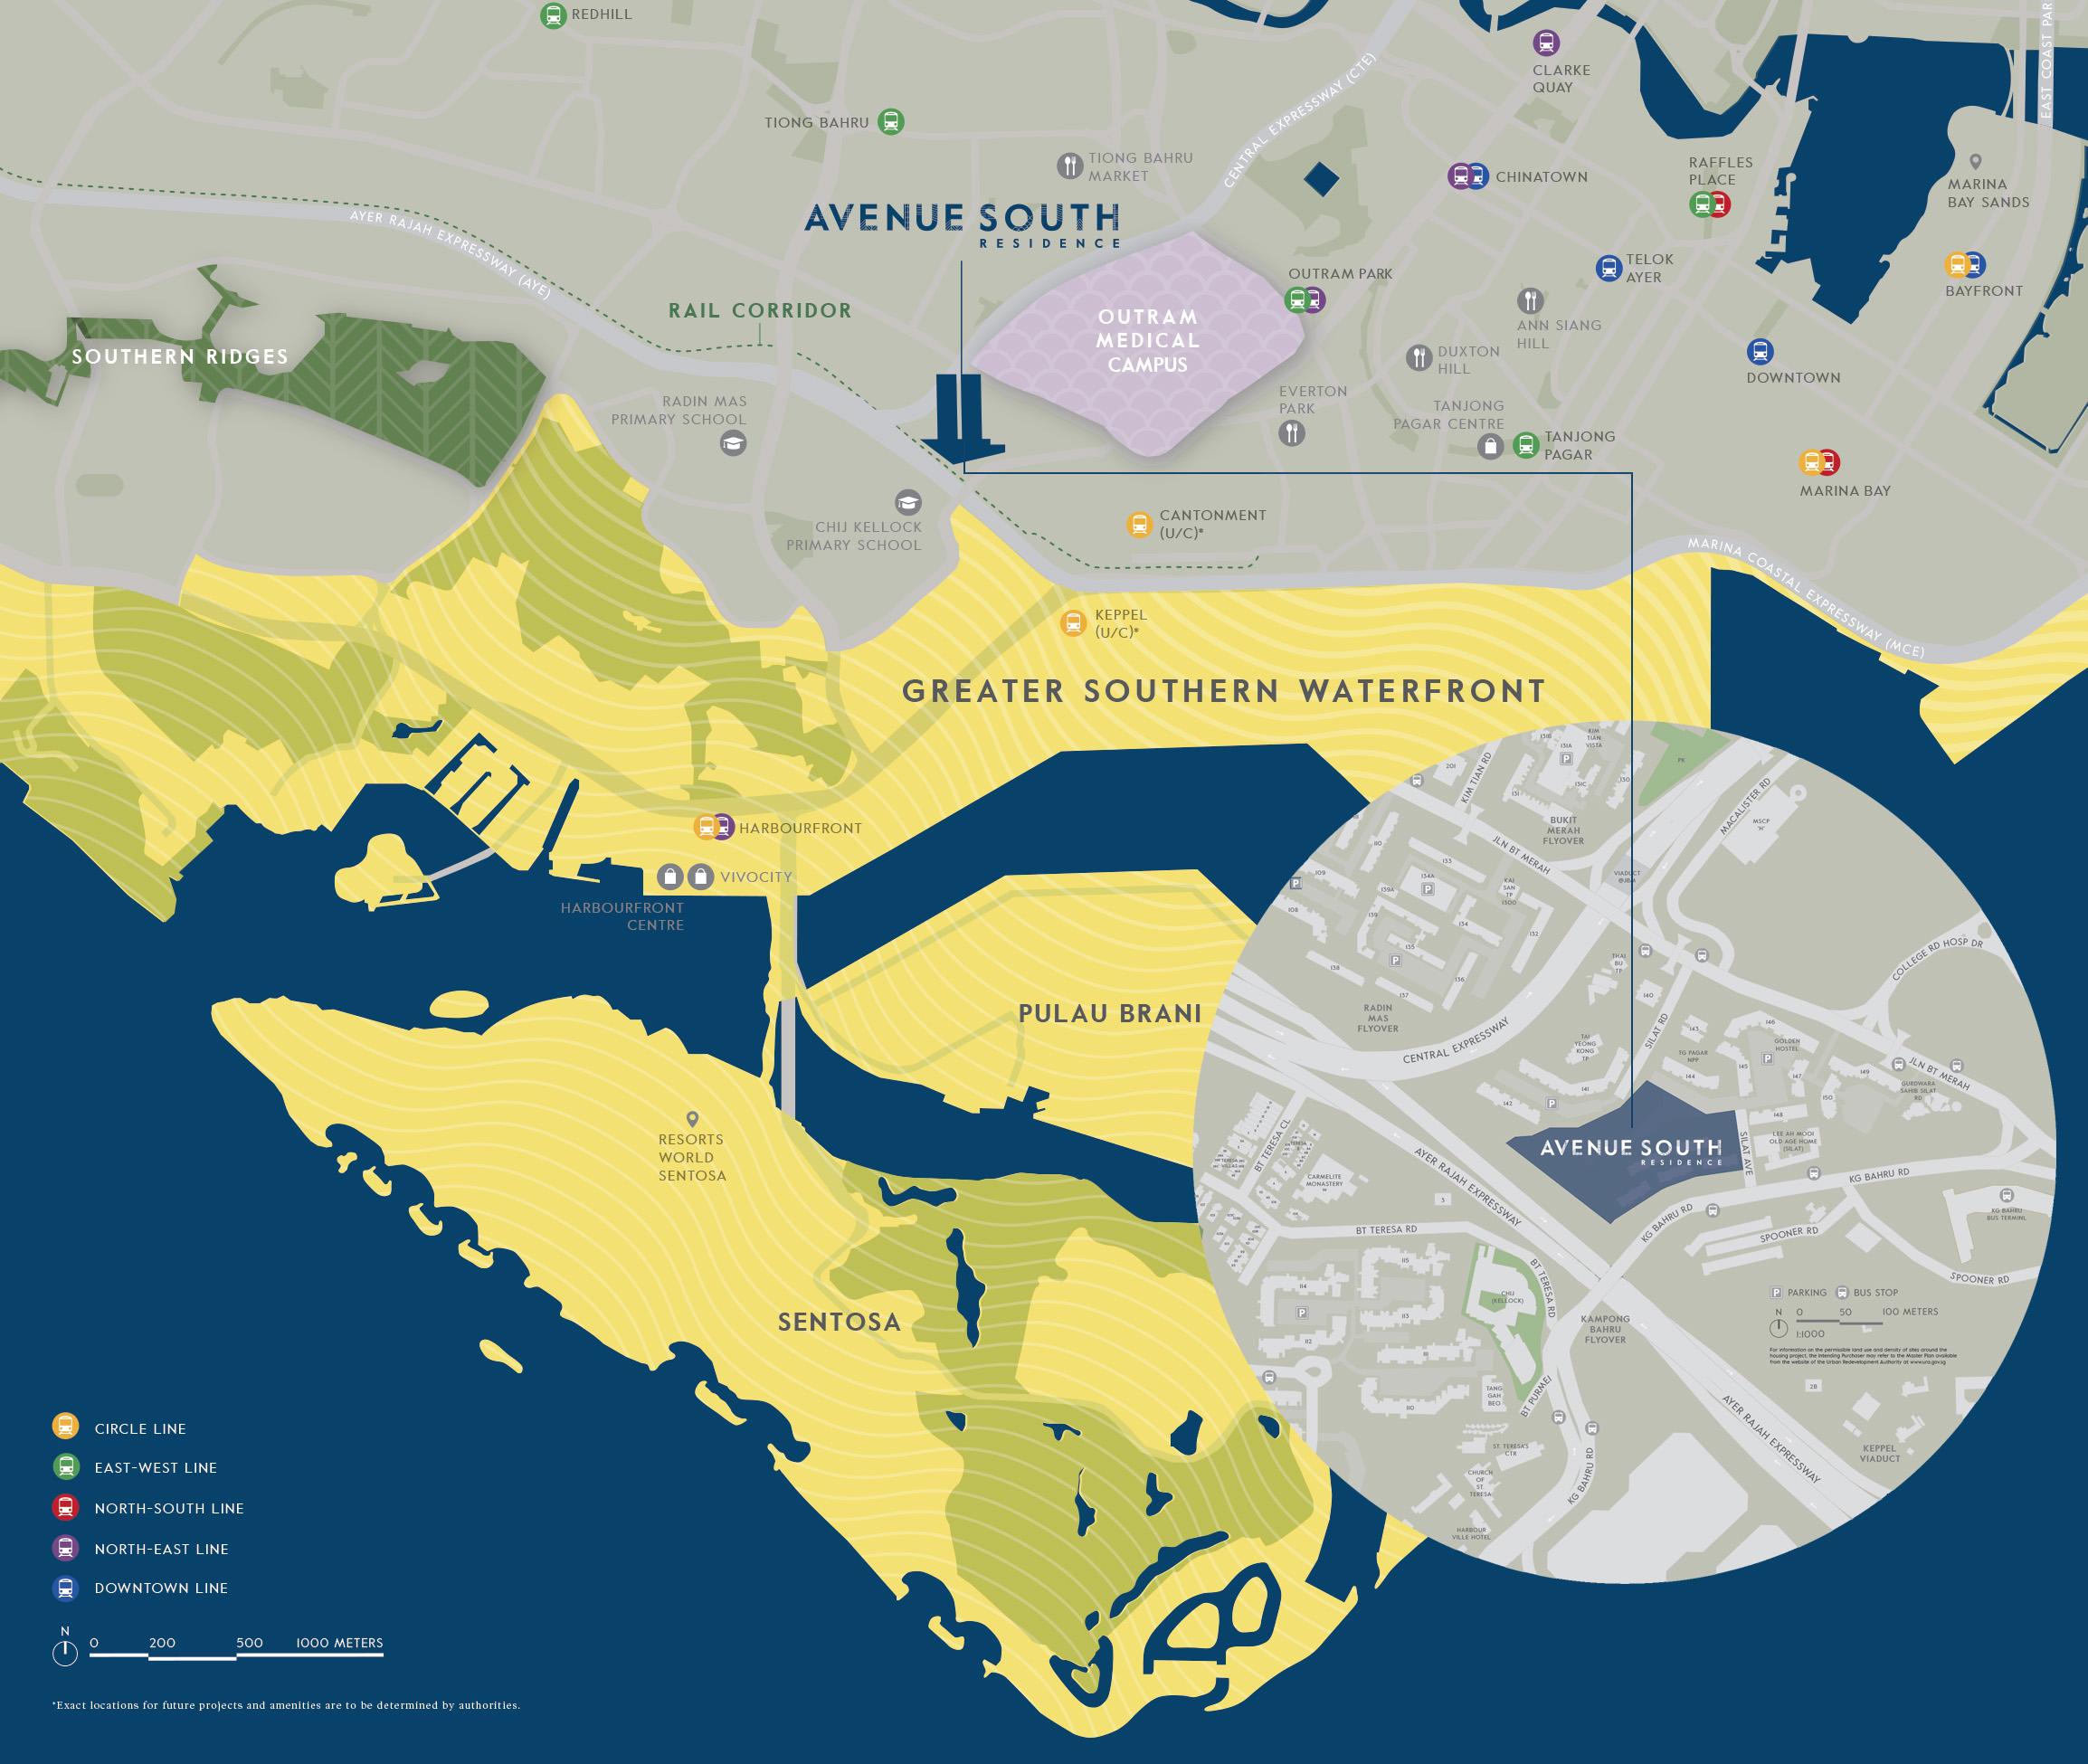 new-condo-singapore-avenue-south-residence-location-map